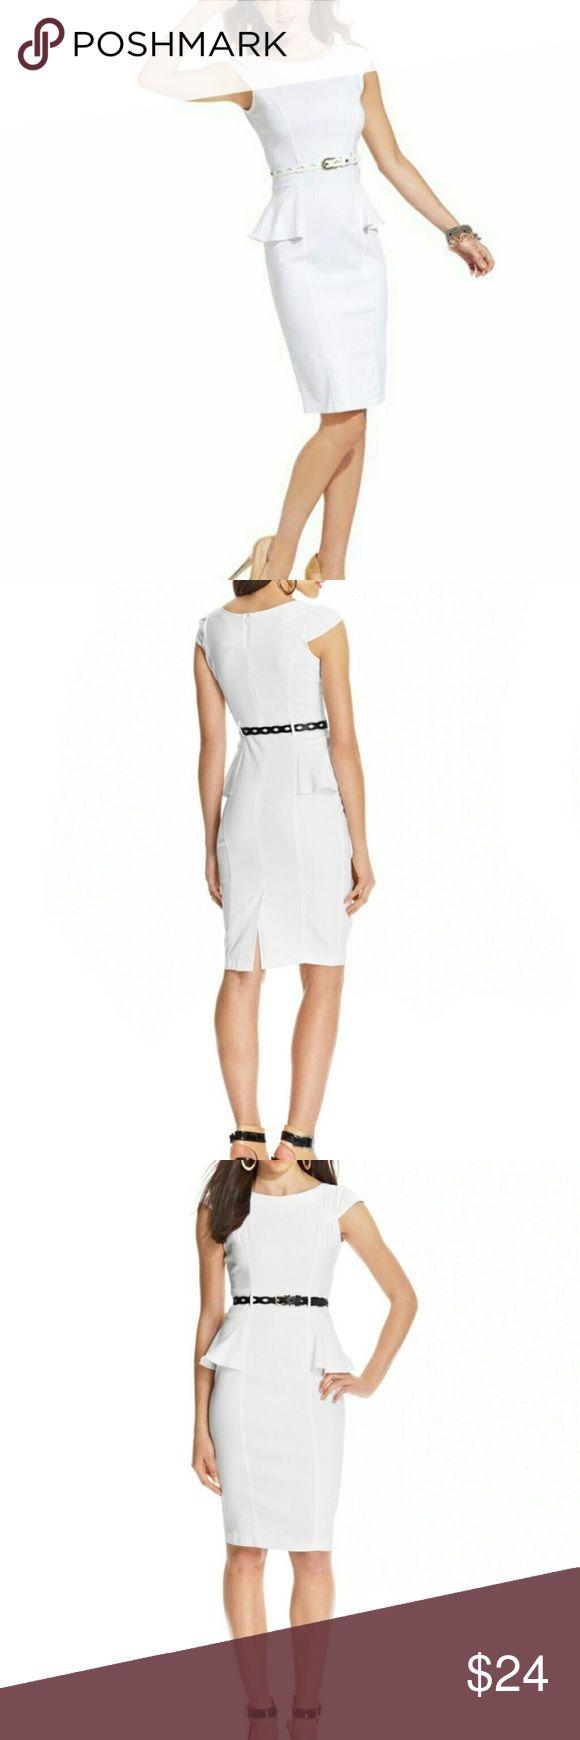 NWOT White peplum dress with cap sleeves Great business dress XOXO Dresses